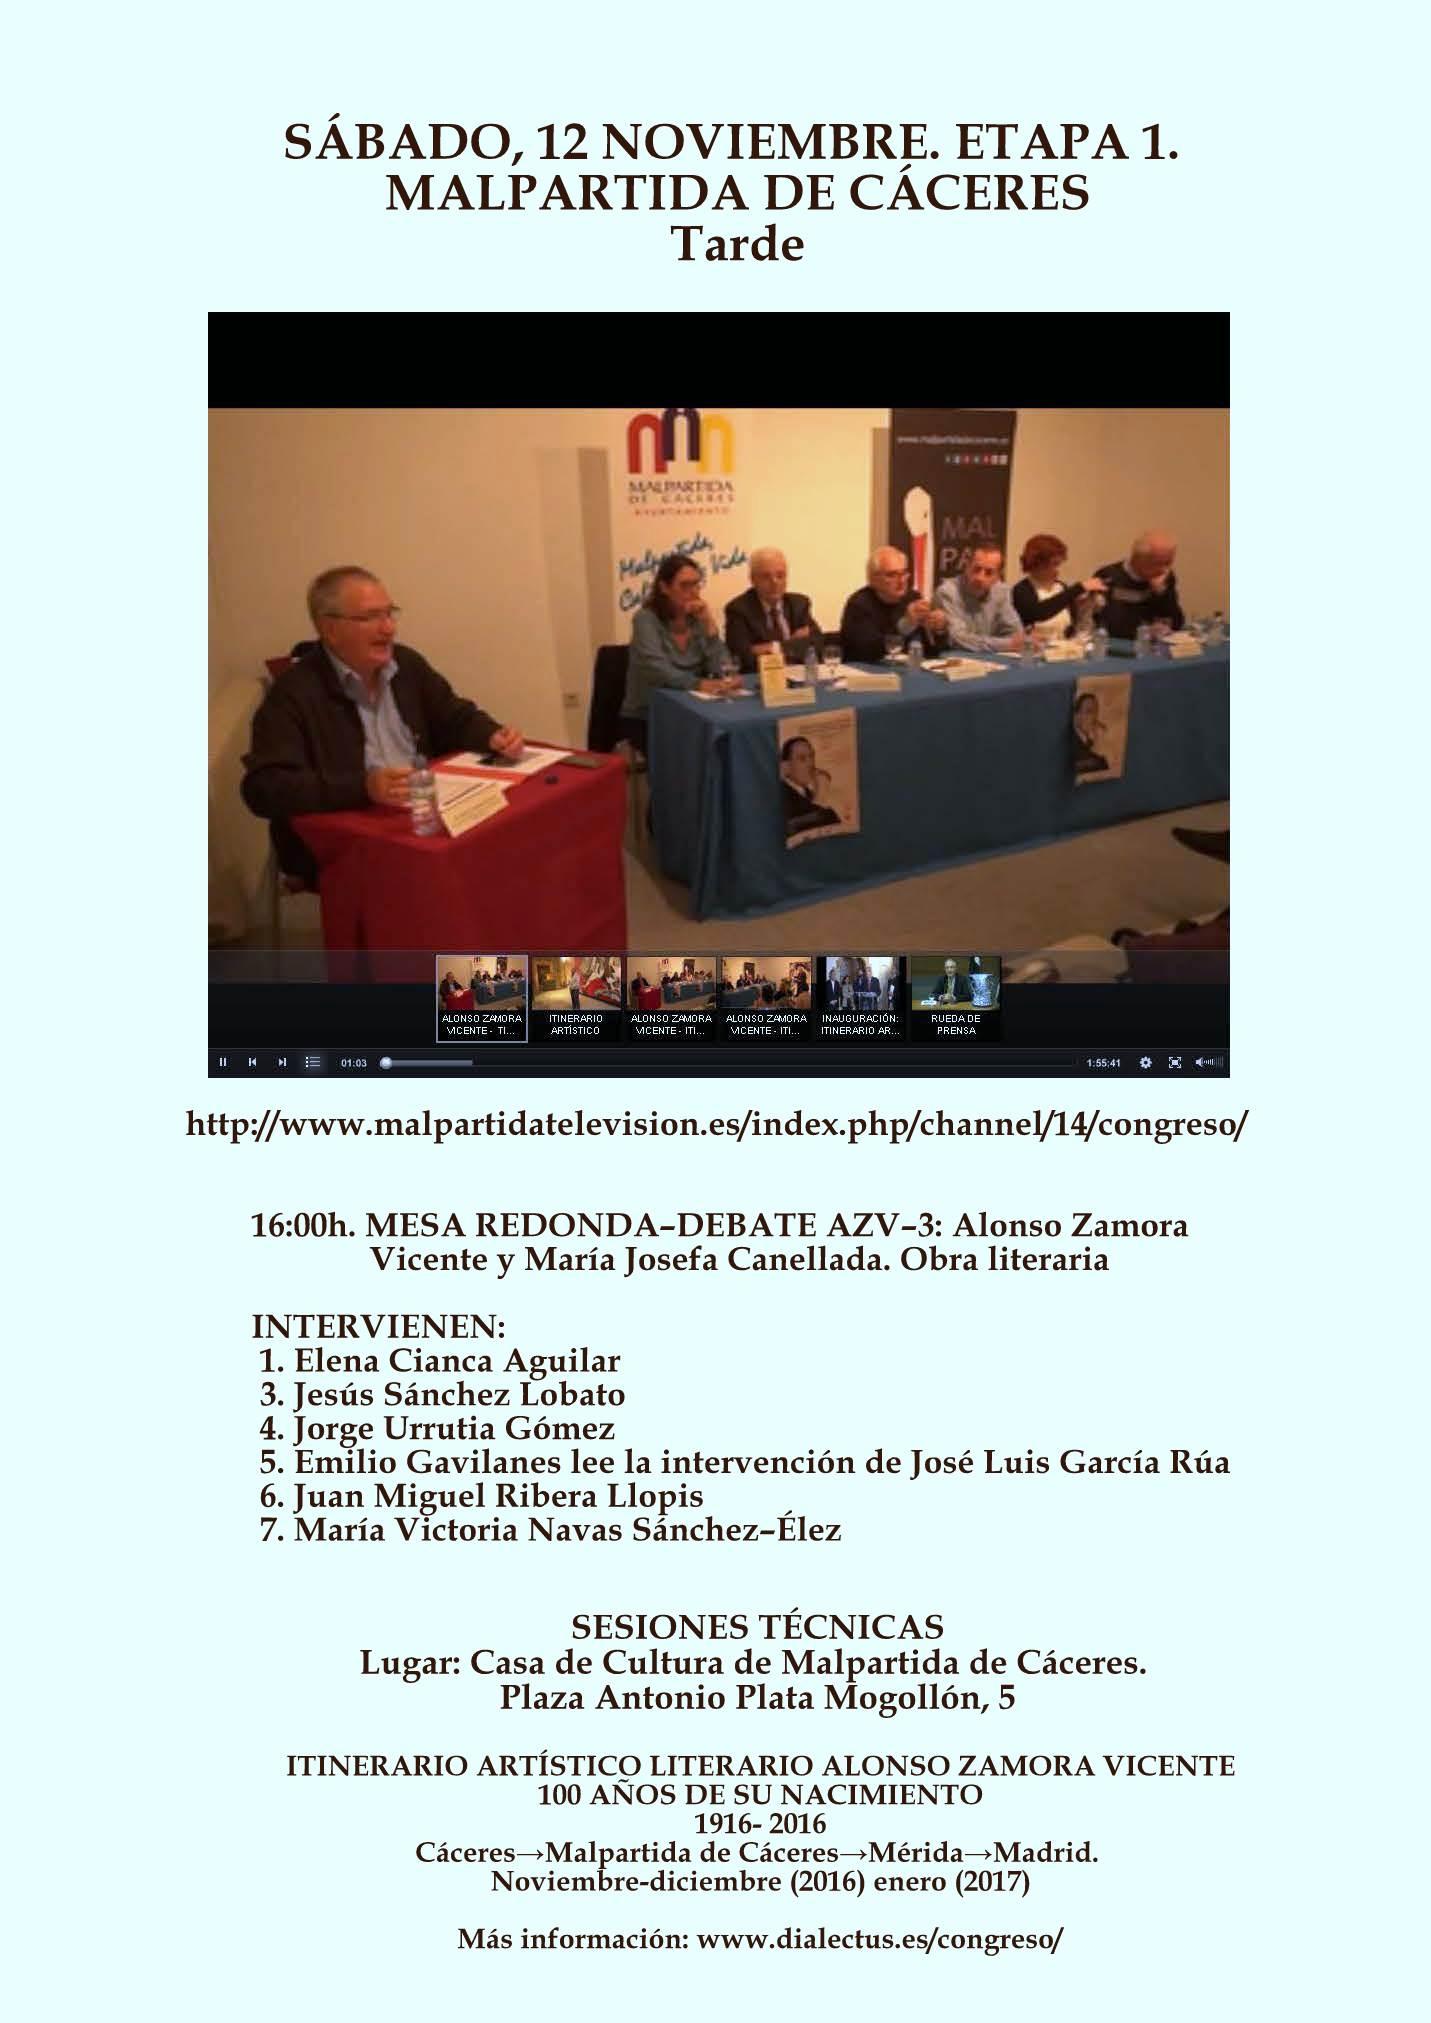 20161206-mesa-azv-3-obra-litera-alonso-zamora-vicente-y-mjcanellada